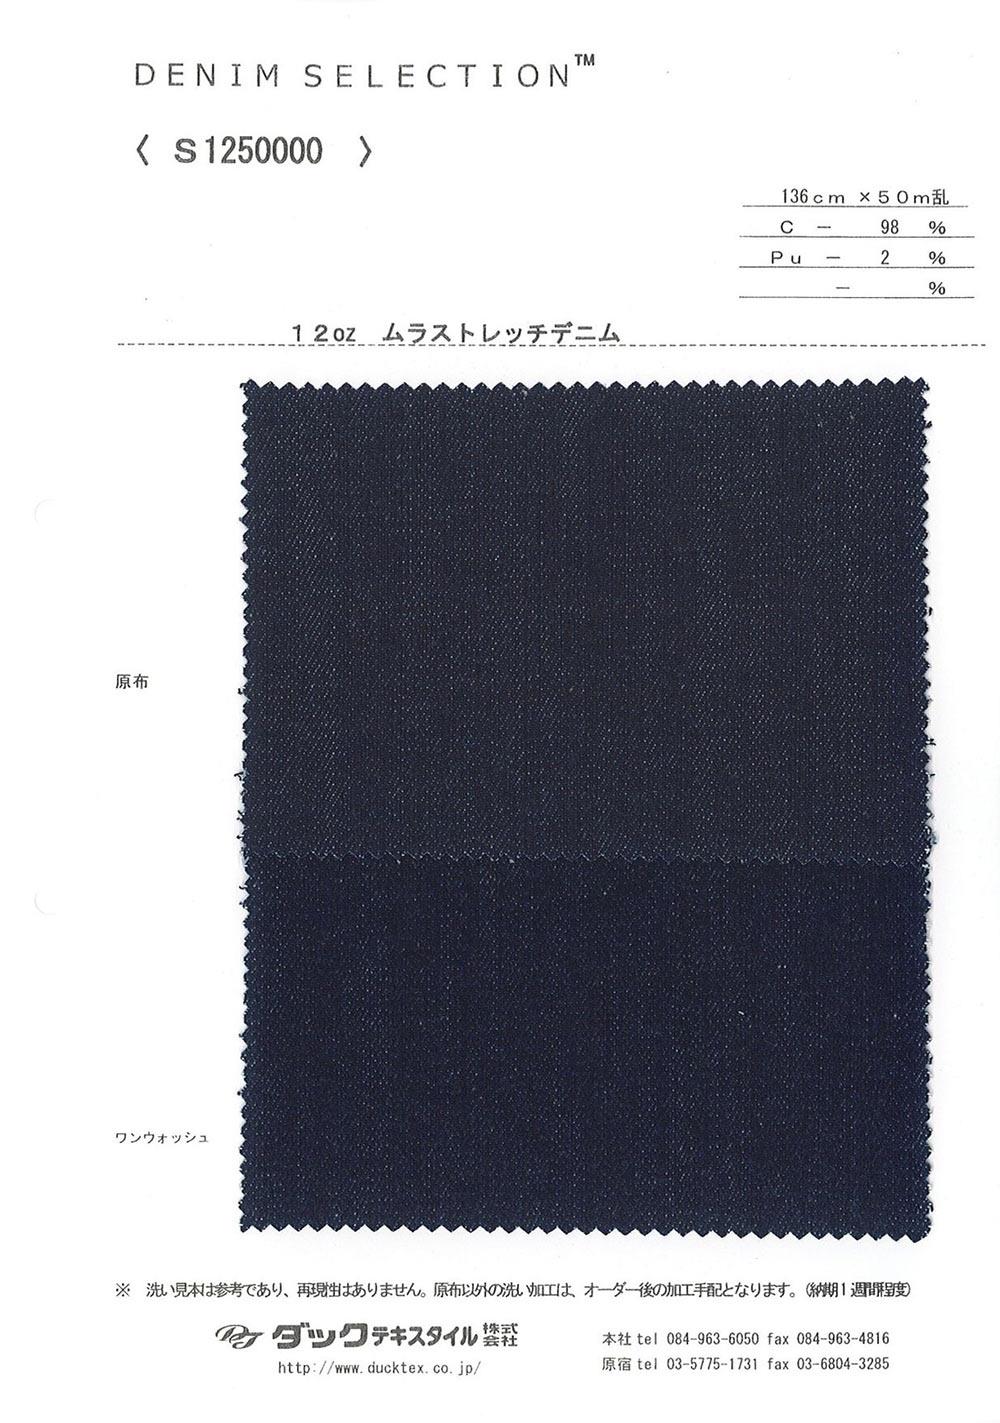 S1250 12オンスムラデニムストレッチ[生地] ダックテキスタイル/オークラ商事 - ApparelX アパレル資材卸通販